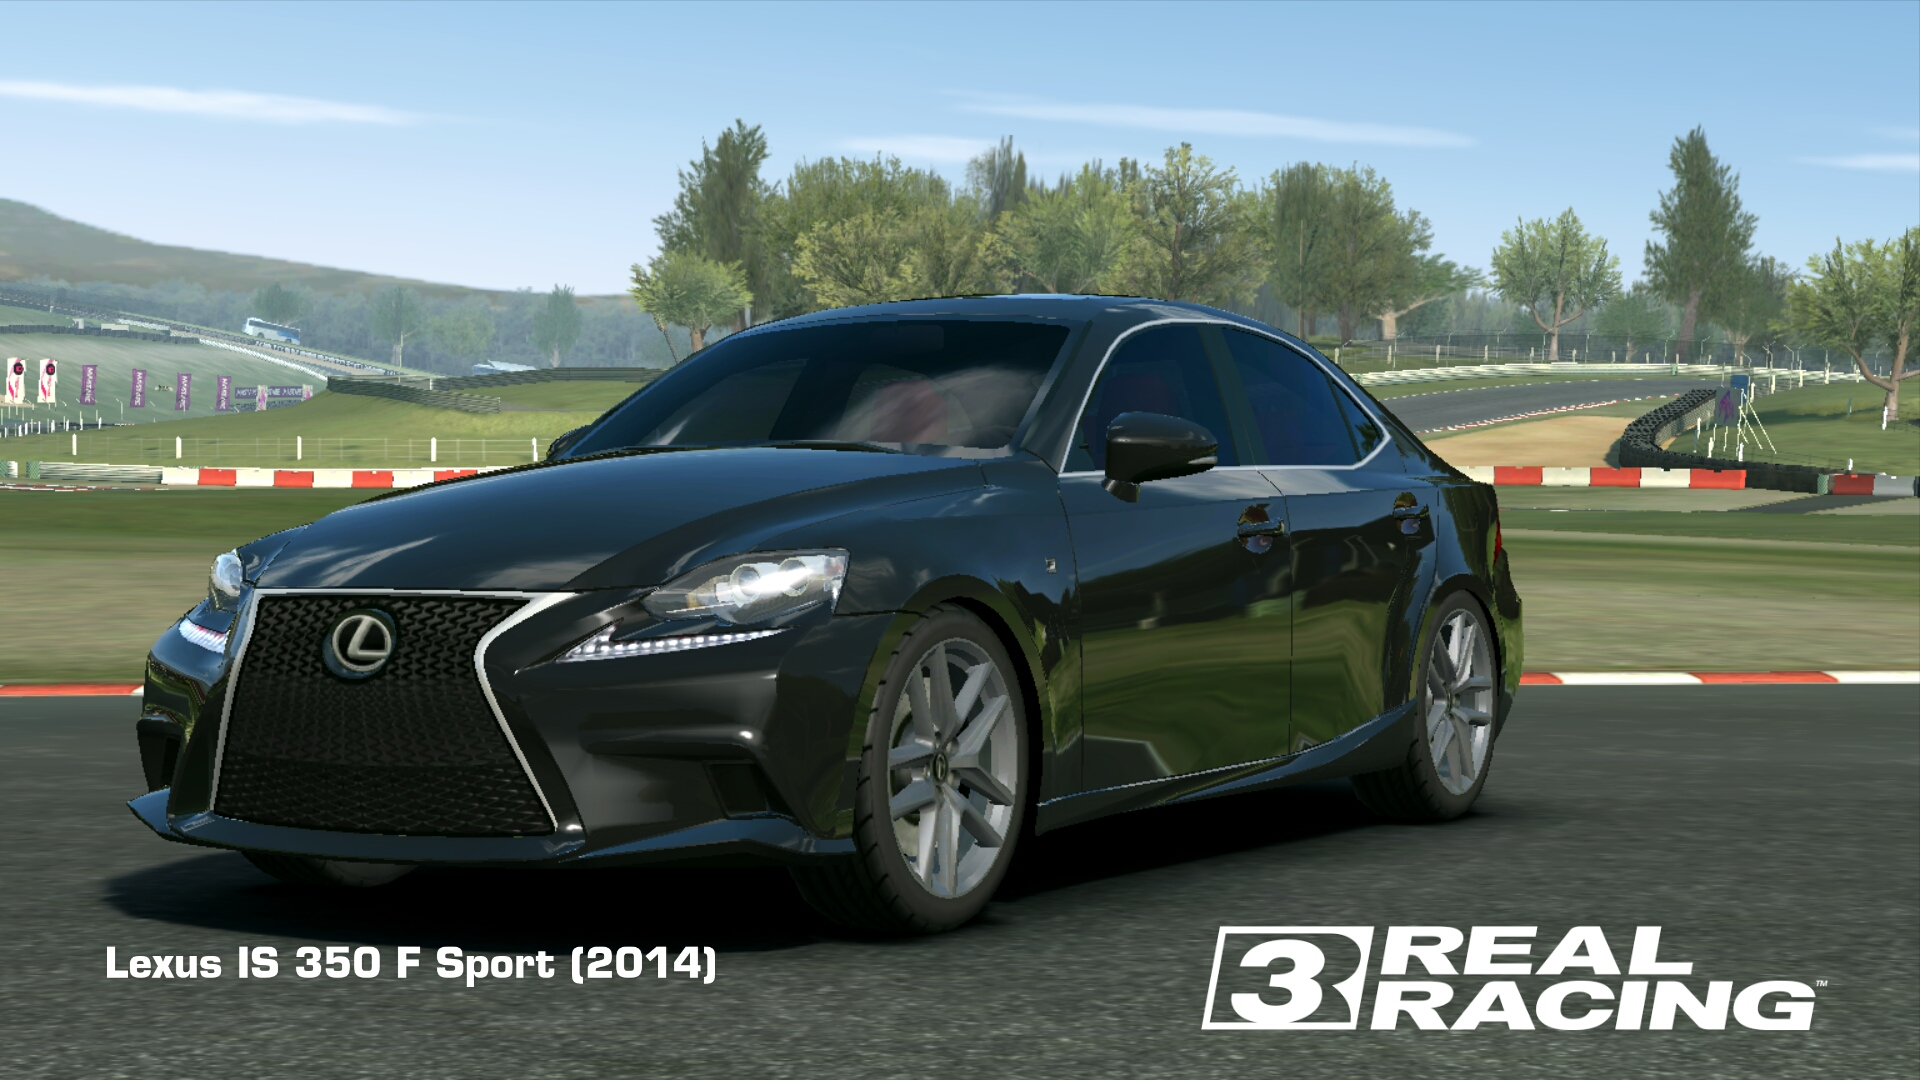 Showcase Lexus IS 350 F Sport (2014)